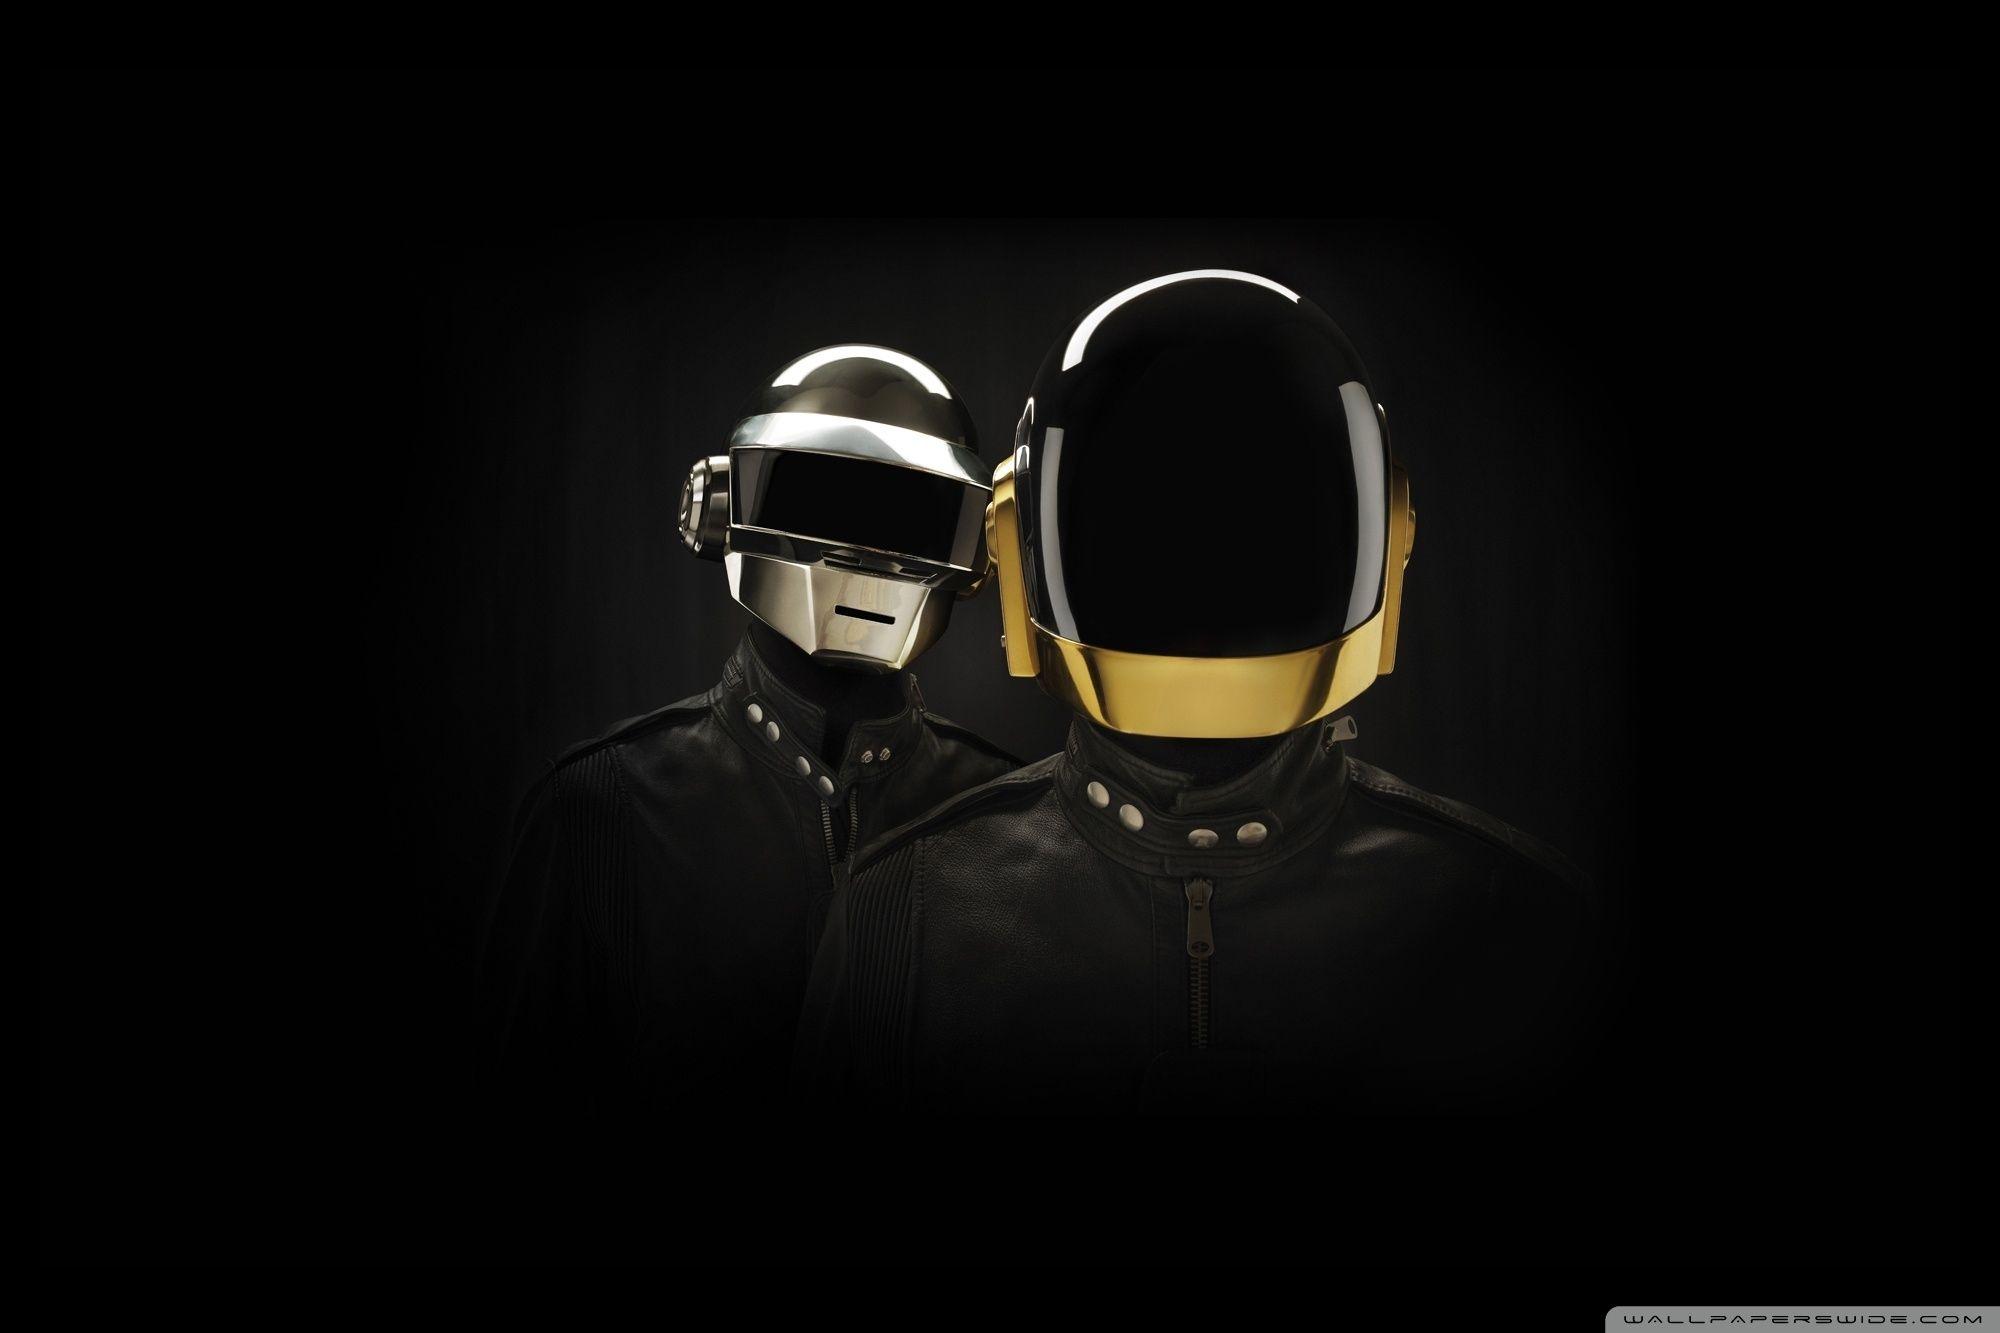 10 Best Daft Punk Hd Wallpaper Full Hd 1920 1080 For Pc Background Daft Punk Punk Hd Wallpaper